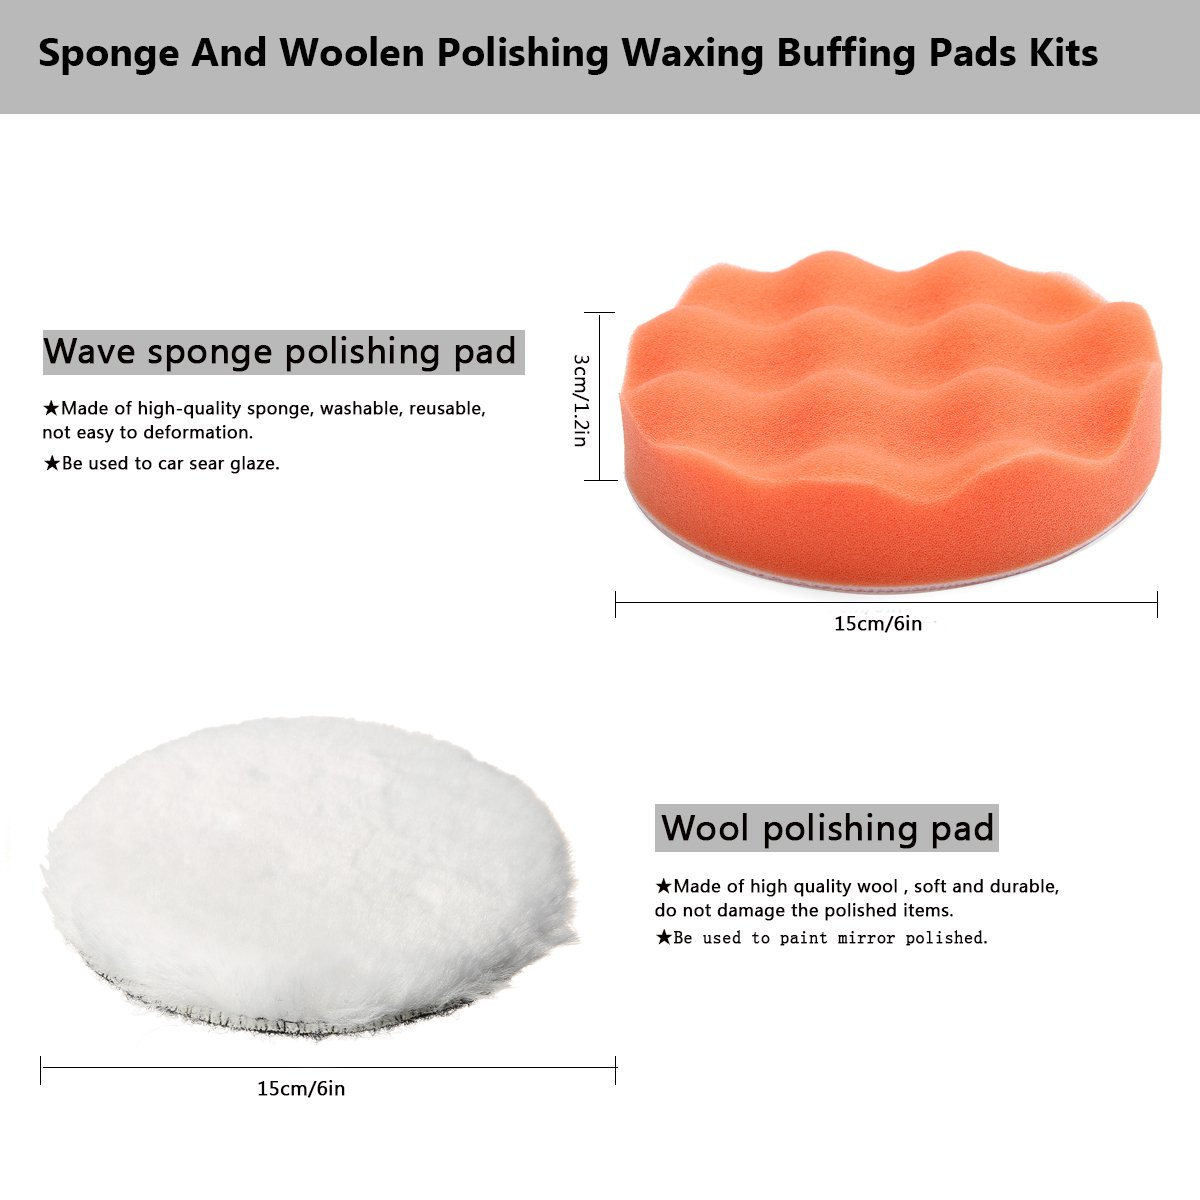 MATCC 7Pcs 6inch Polishing pads,Sponge and Woolen Polishing Waxing Buffing Pads Kits with M14 Drill Adapter, 6inchs by MATCC (Image #2)